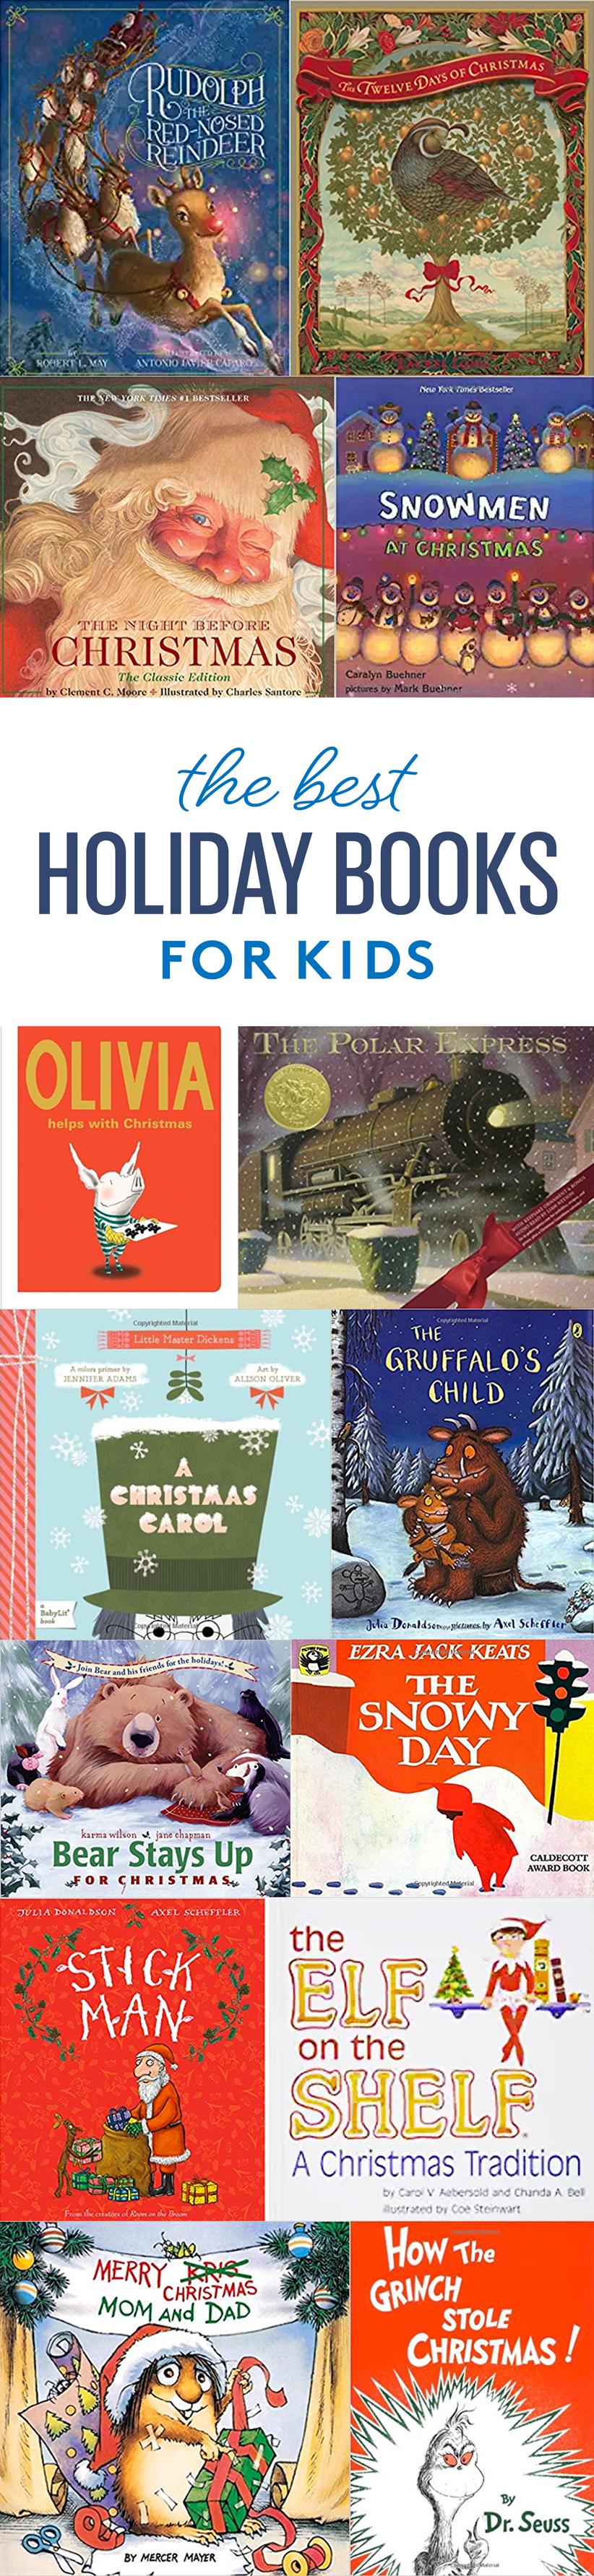 20 Timeless Christmas Books for Kids Christmas books for